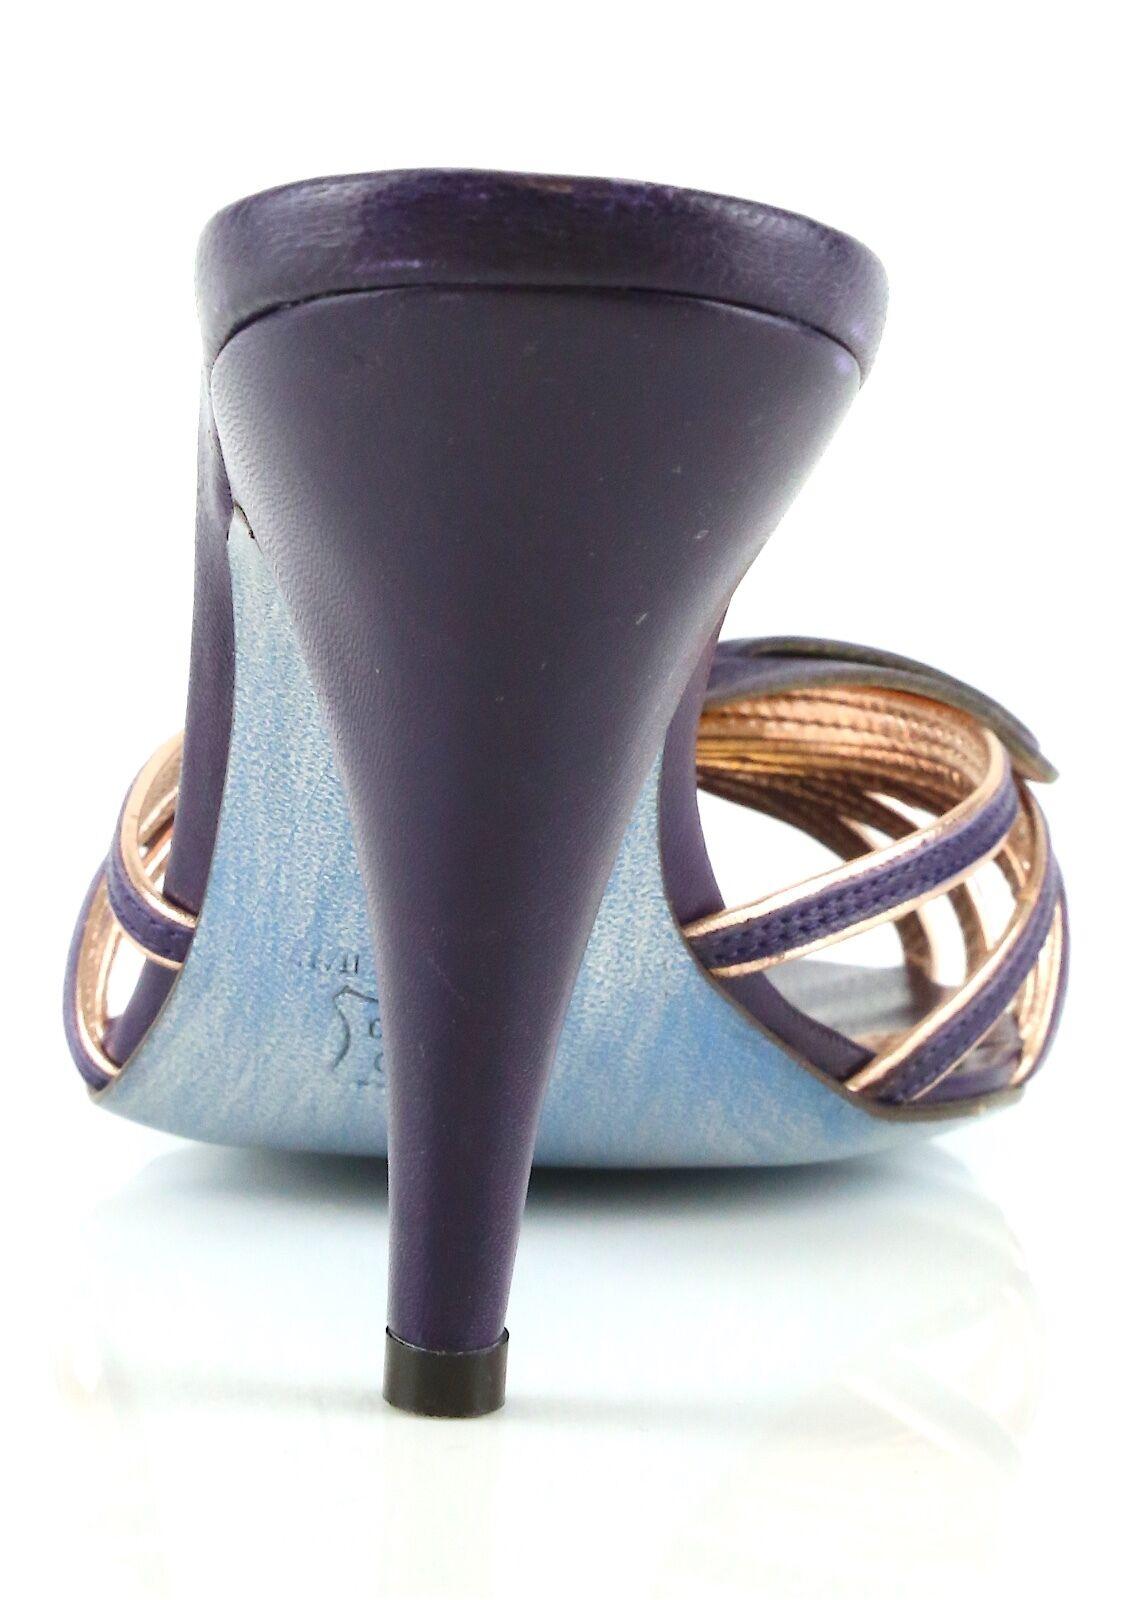 Jean-Michel Cazabat lila Leather Bow Slip Slip Slip On Heels 8938 Größe 36 EU NEW 1e9327